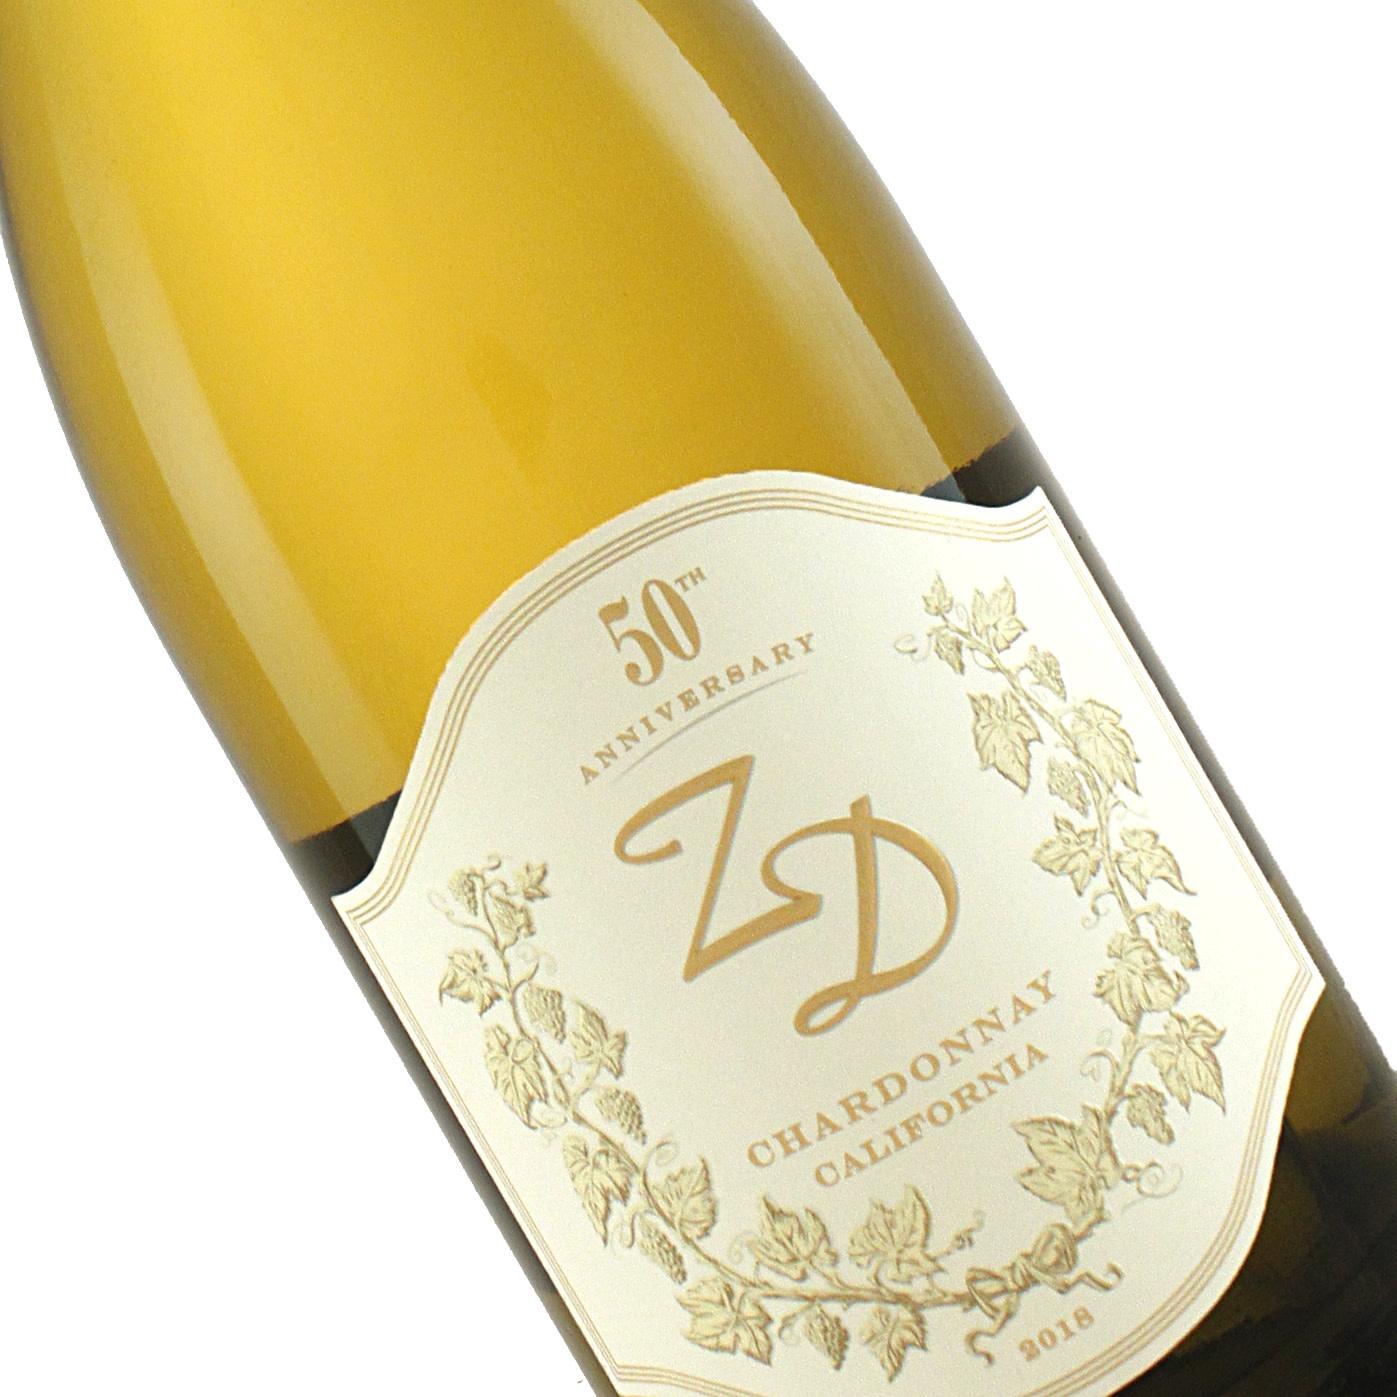 ZD Wines 2018 Chardonnay, California